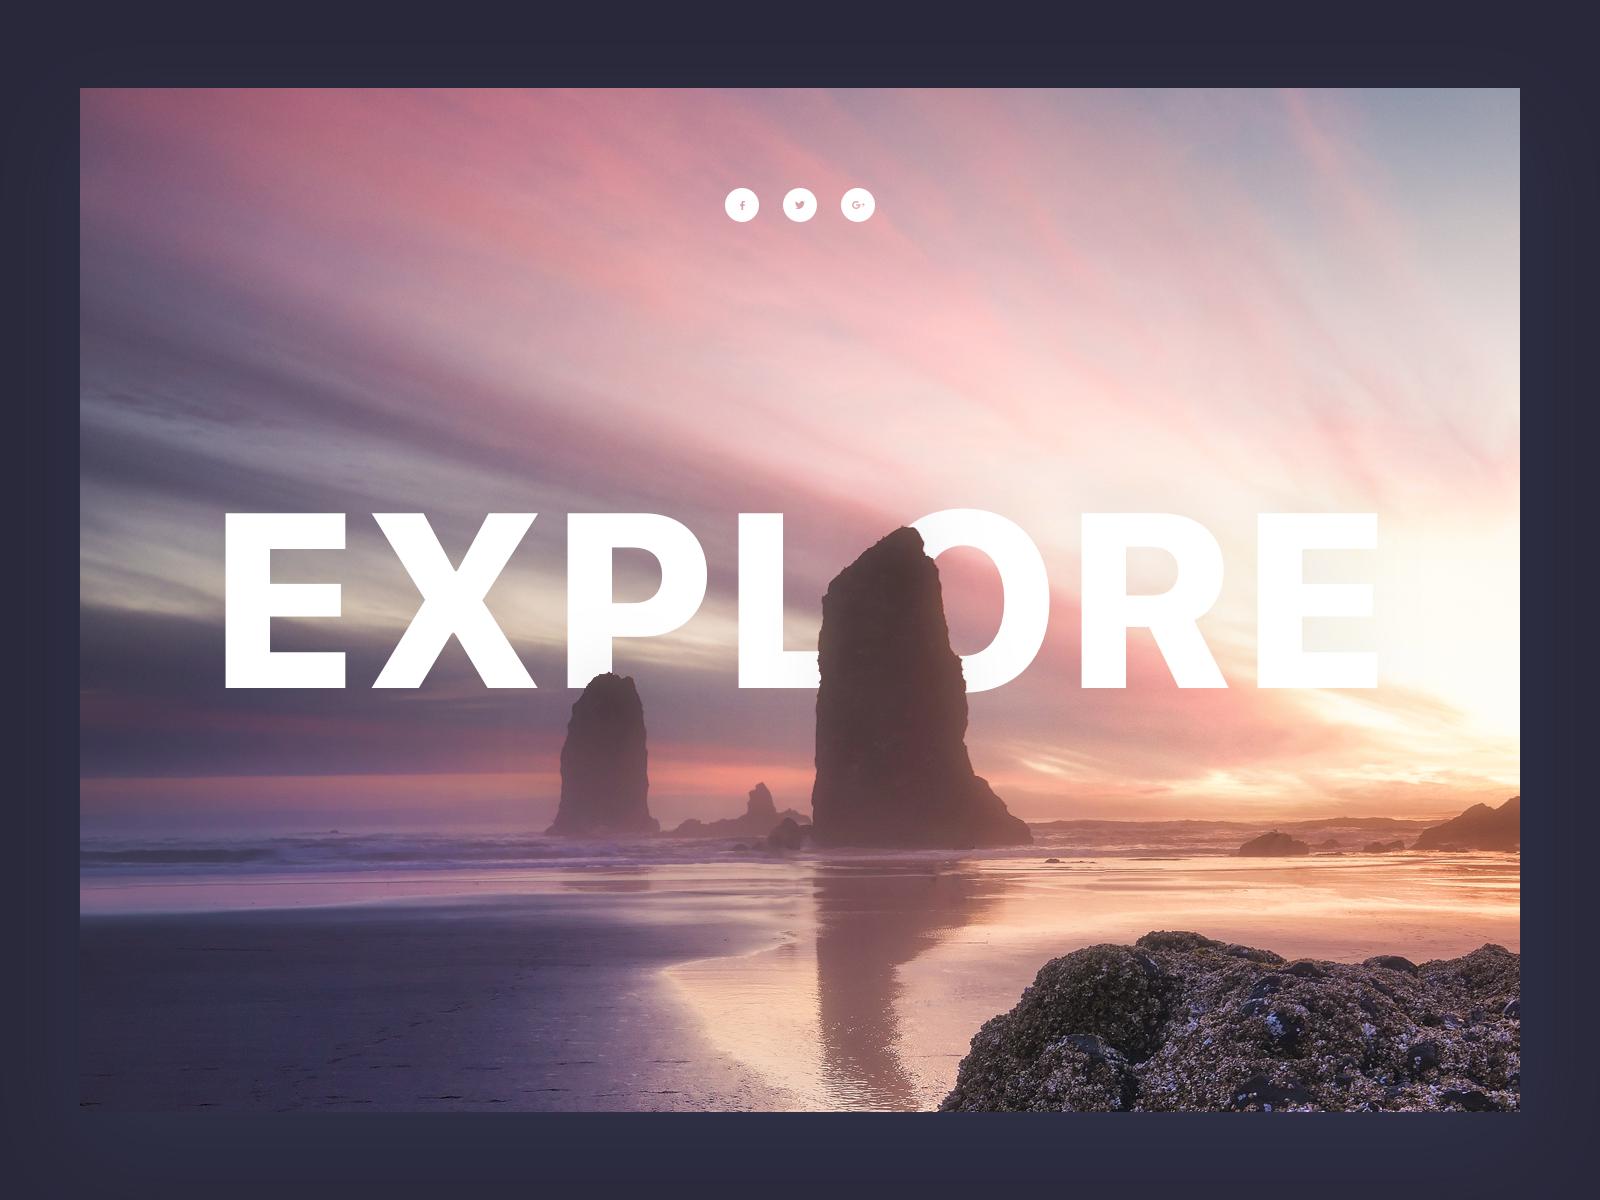 Landing Page Builder Section island tourist travel social media buttons ui kit inspirational section header typografy text cutout design landscape